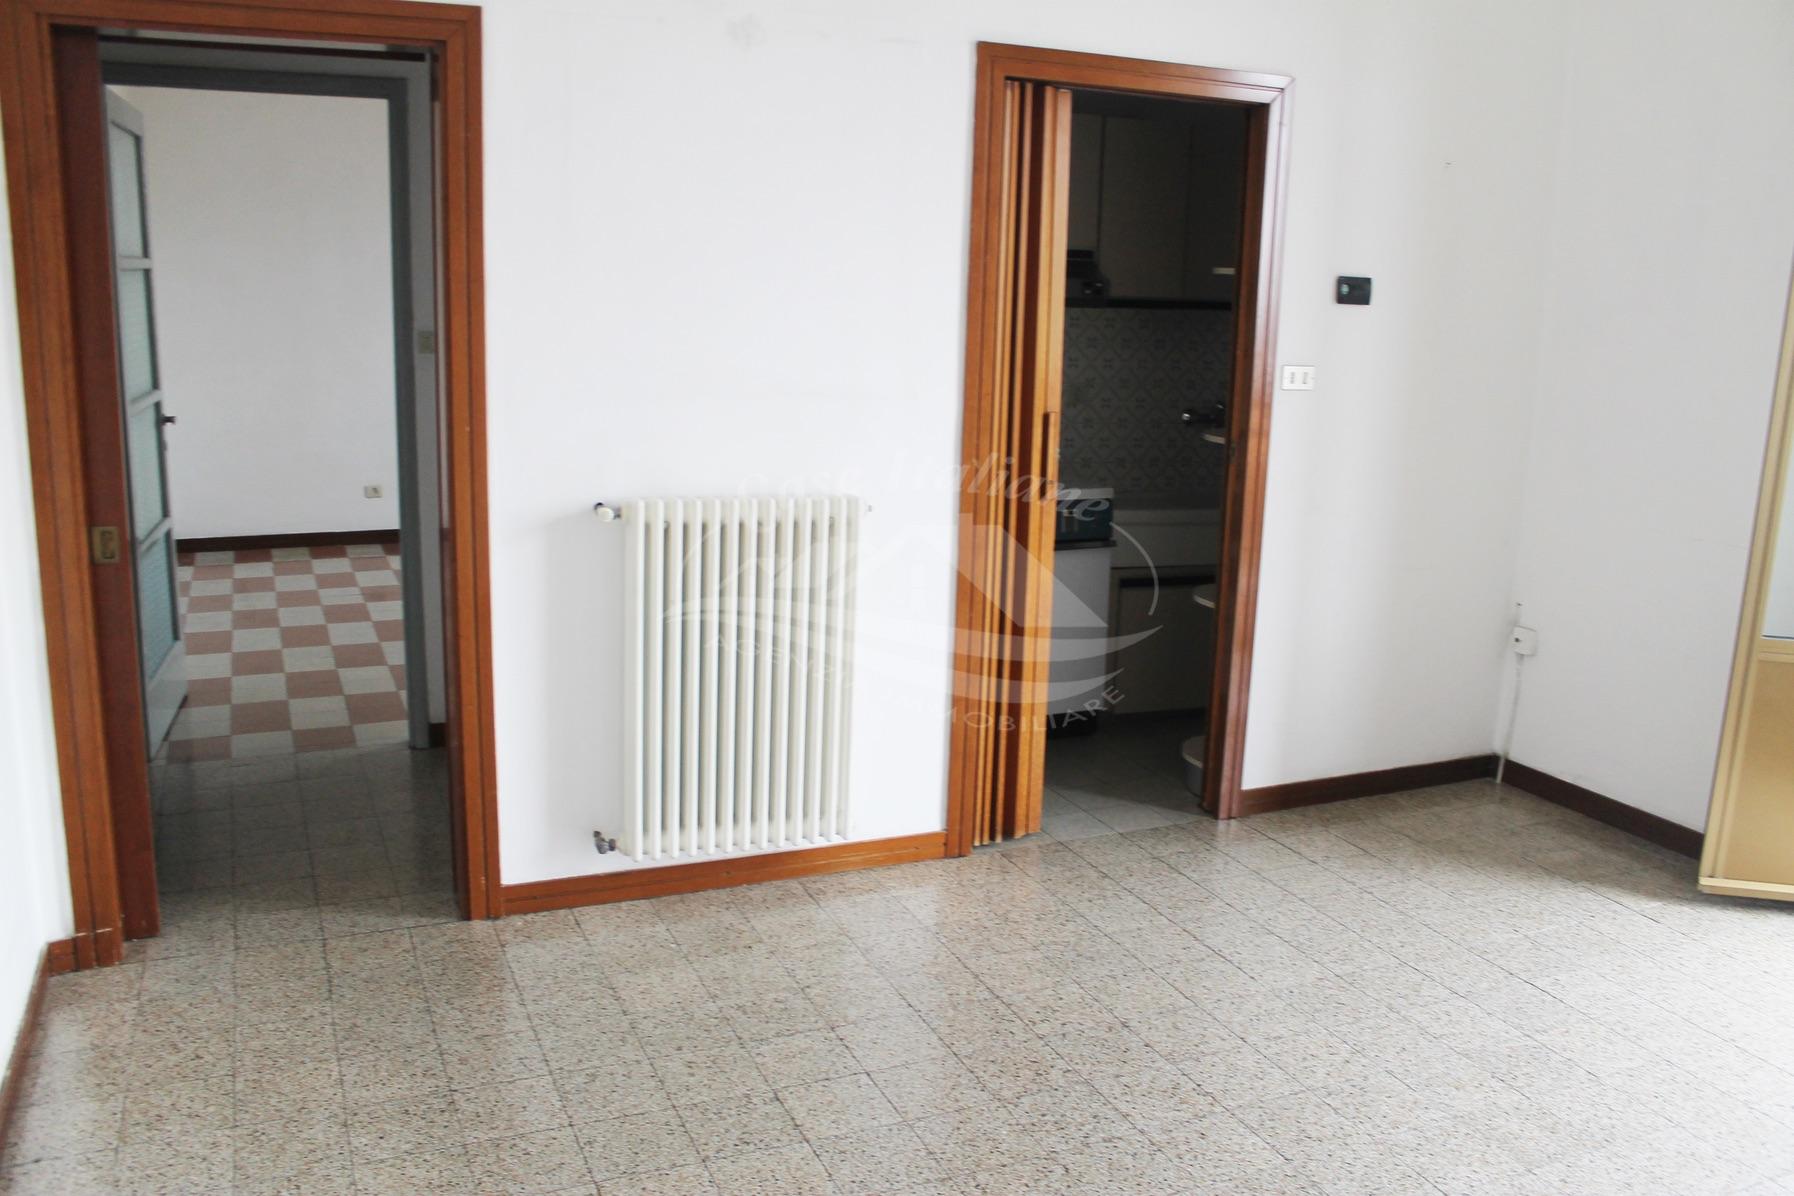 Appartamento con  balcone panoramico a Cantu'